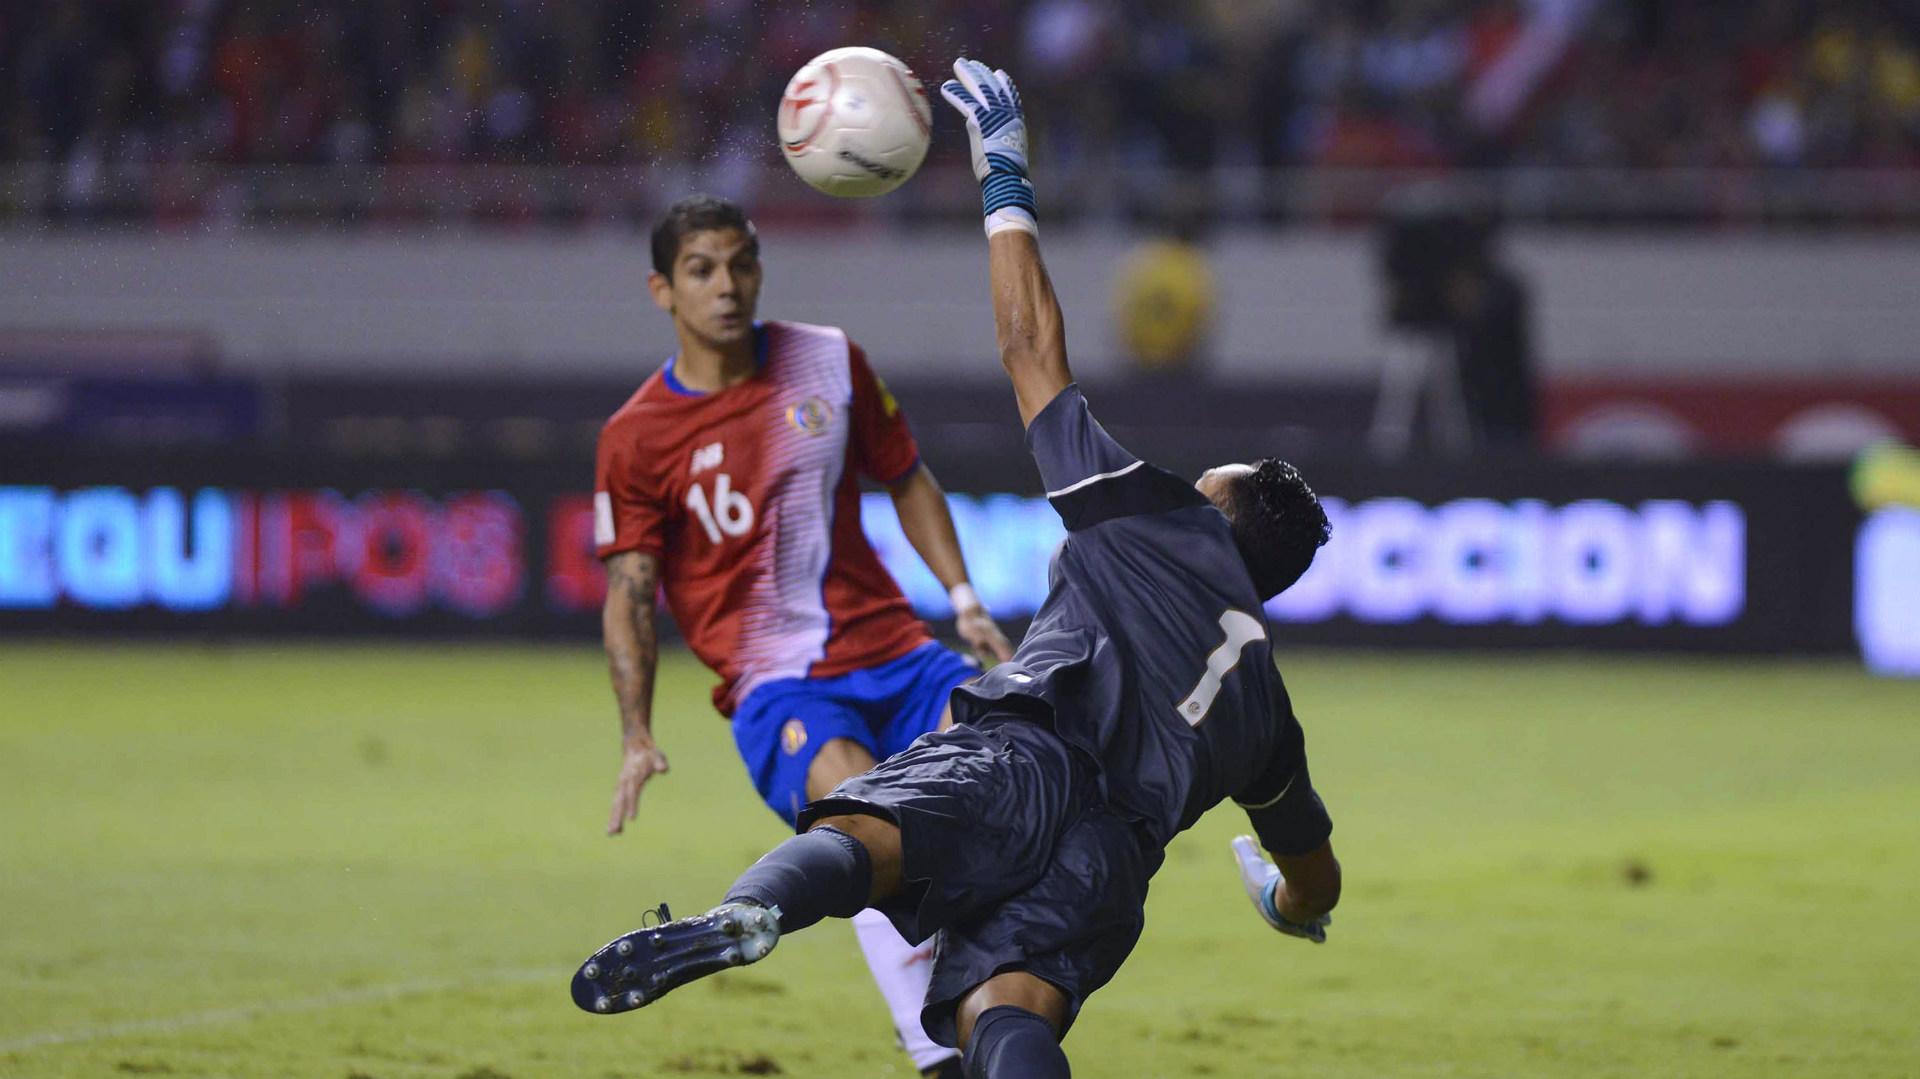 Mexico vs Costa Rica Keylor Navas Guillermo Ochoa steal show in